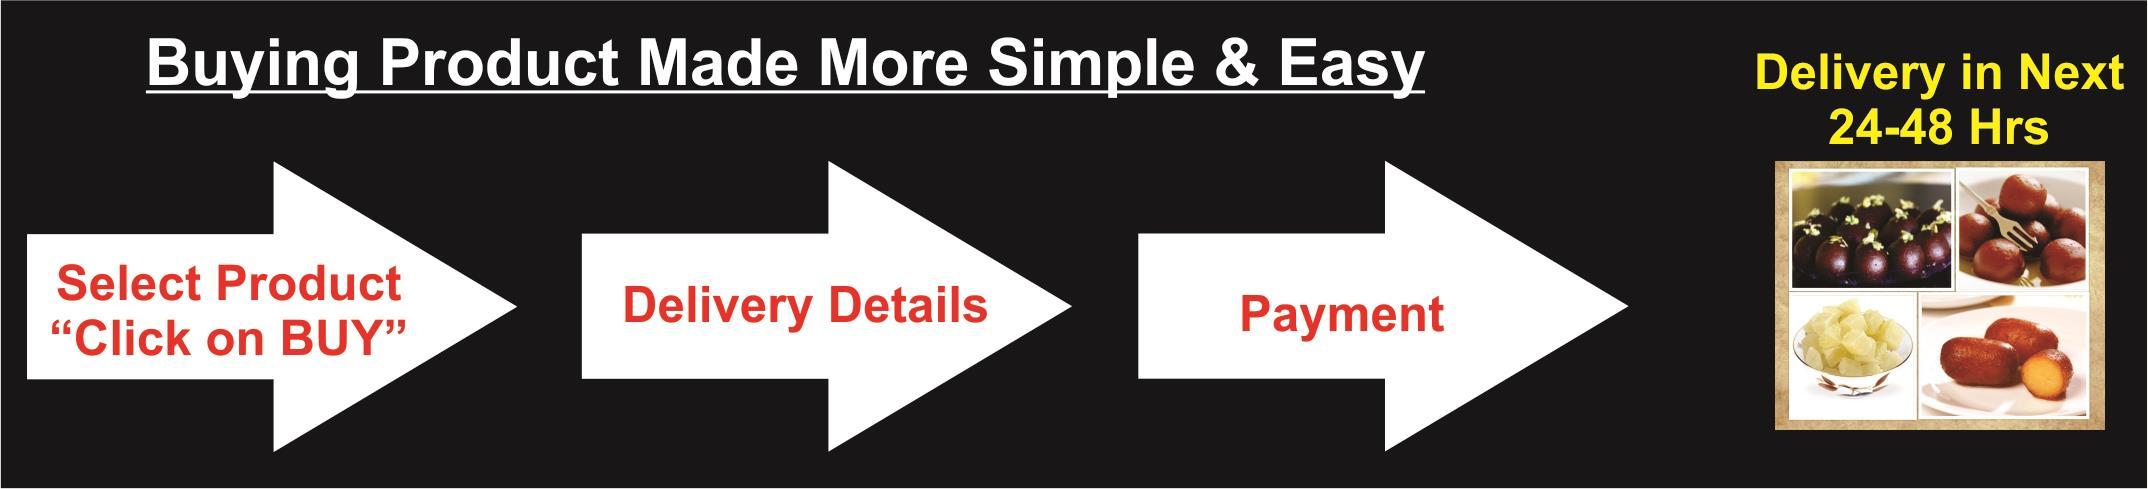 Buying made more Easy & Simple - by vilankar's Delight's  http://goo.gl/zrPBwg - by Vilankar's Group, Mumbai